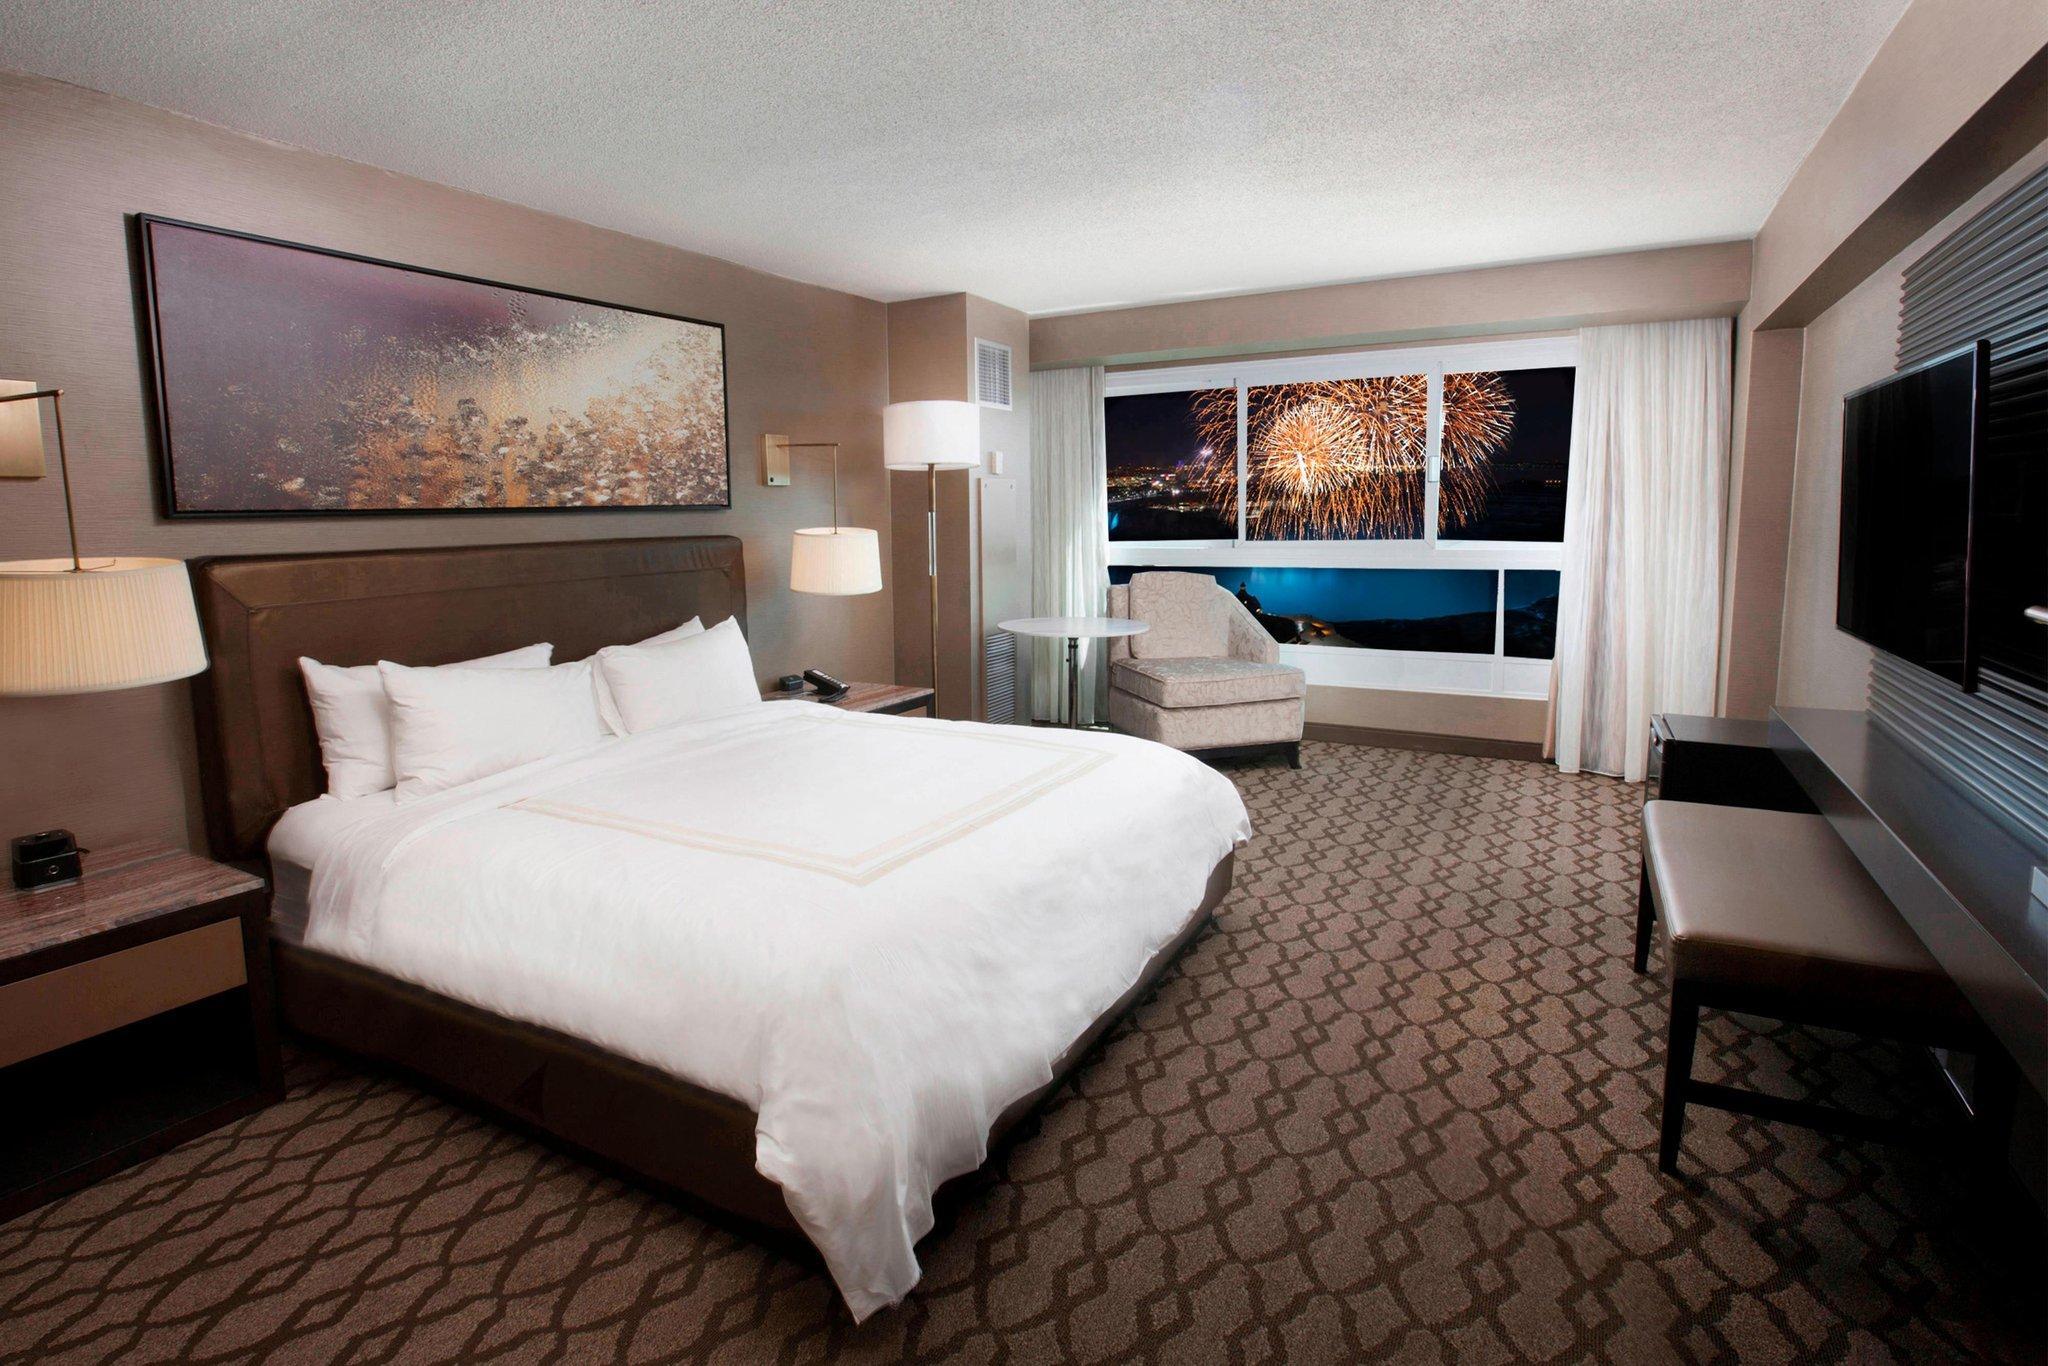 Full Size of Kingsize Bett Niagara Falls Marriott Fallsview Hotel Spa Poco Paradies Betten 90x200 Stauraum Outlet Mit Matratze Und Lattenrost 140x200 Somnus Barock Modern Bett Kingsize Bett